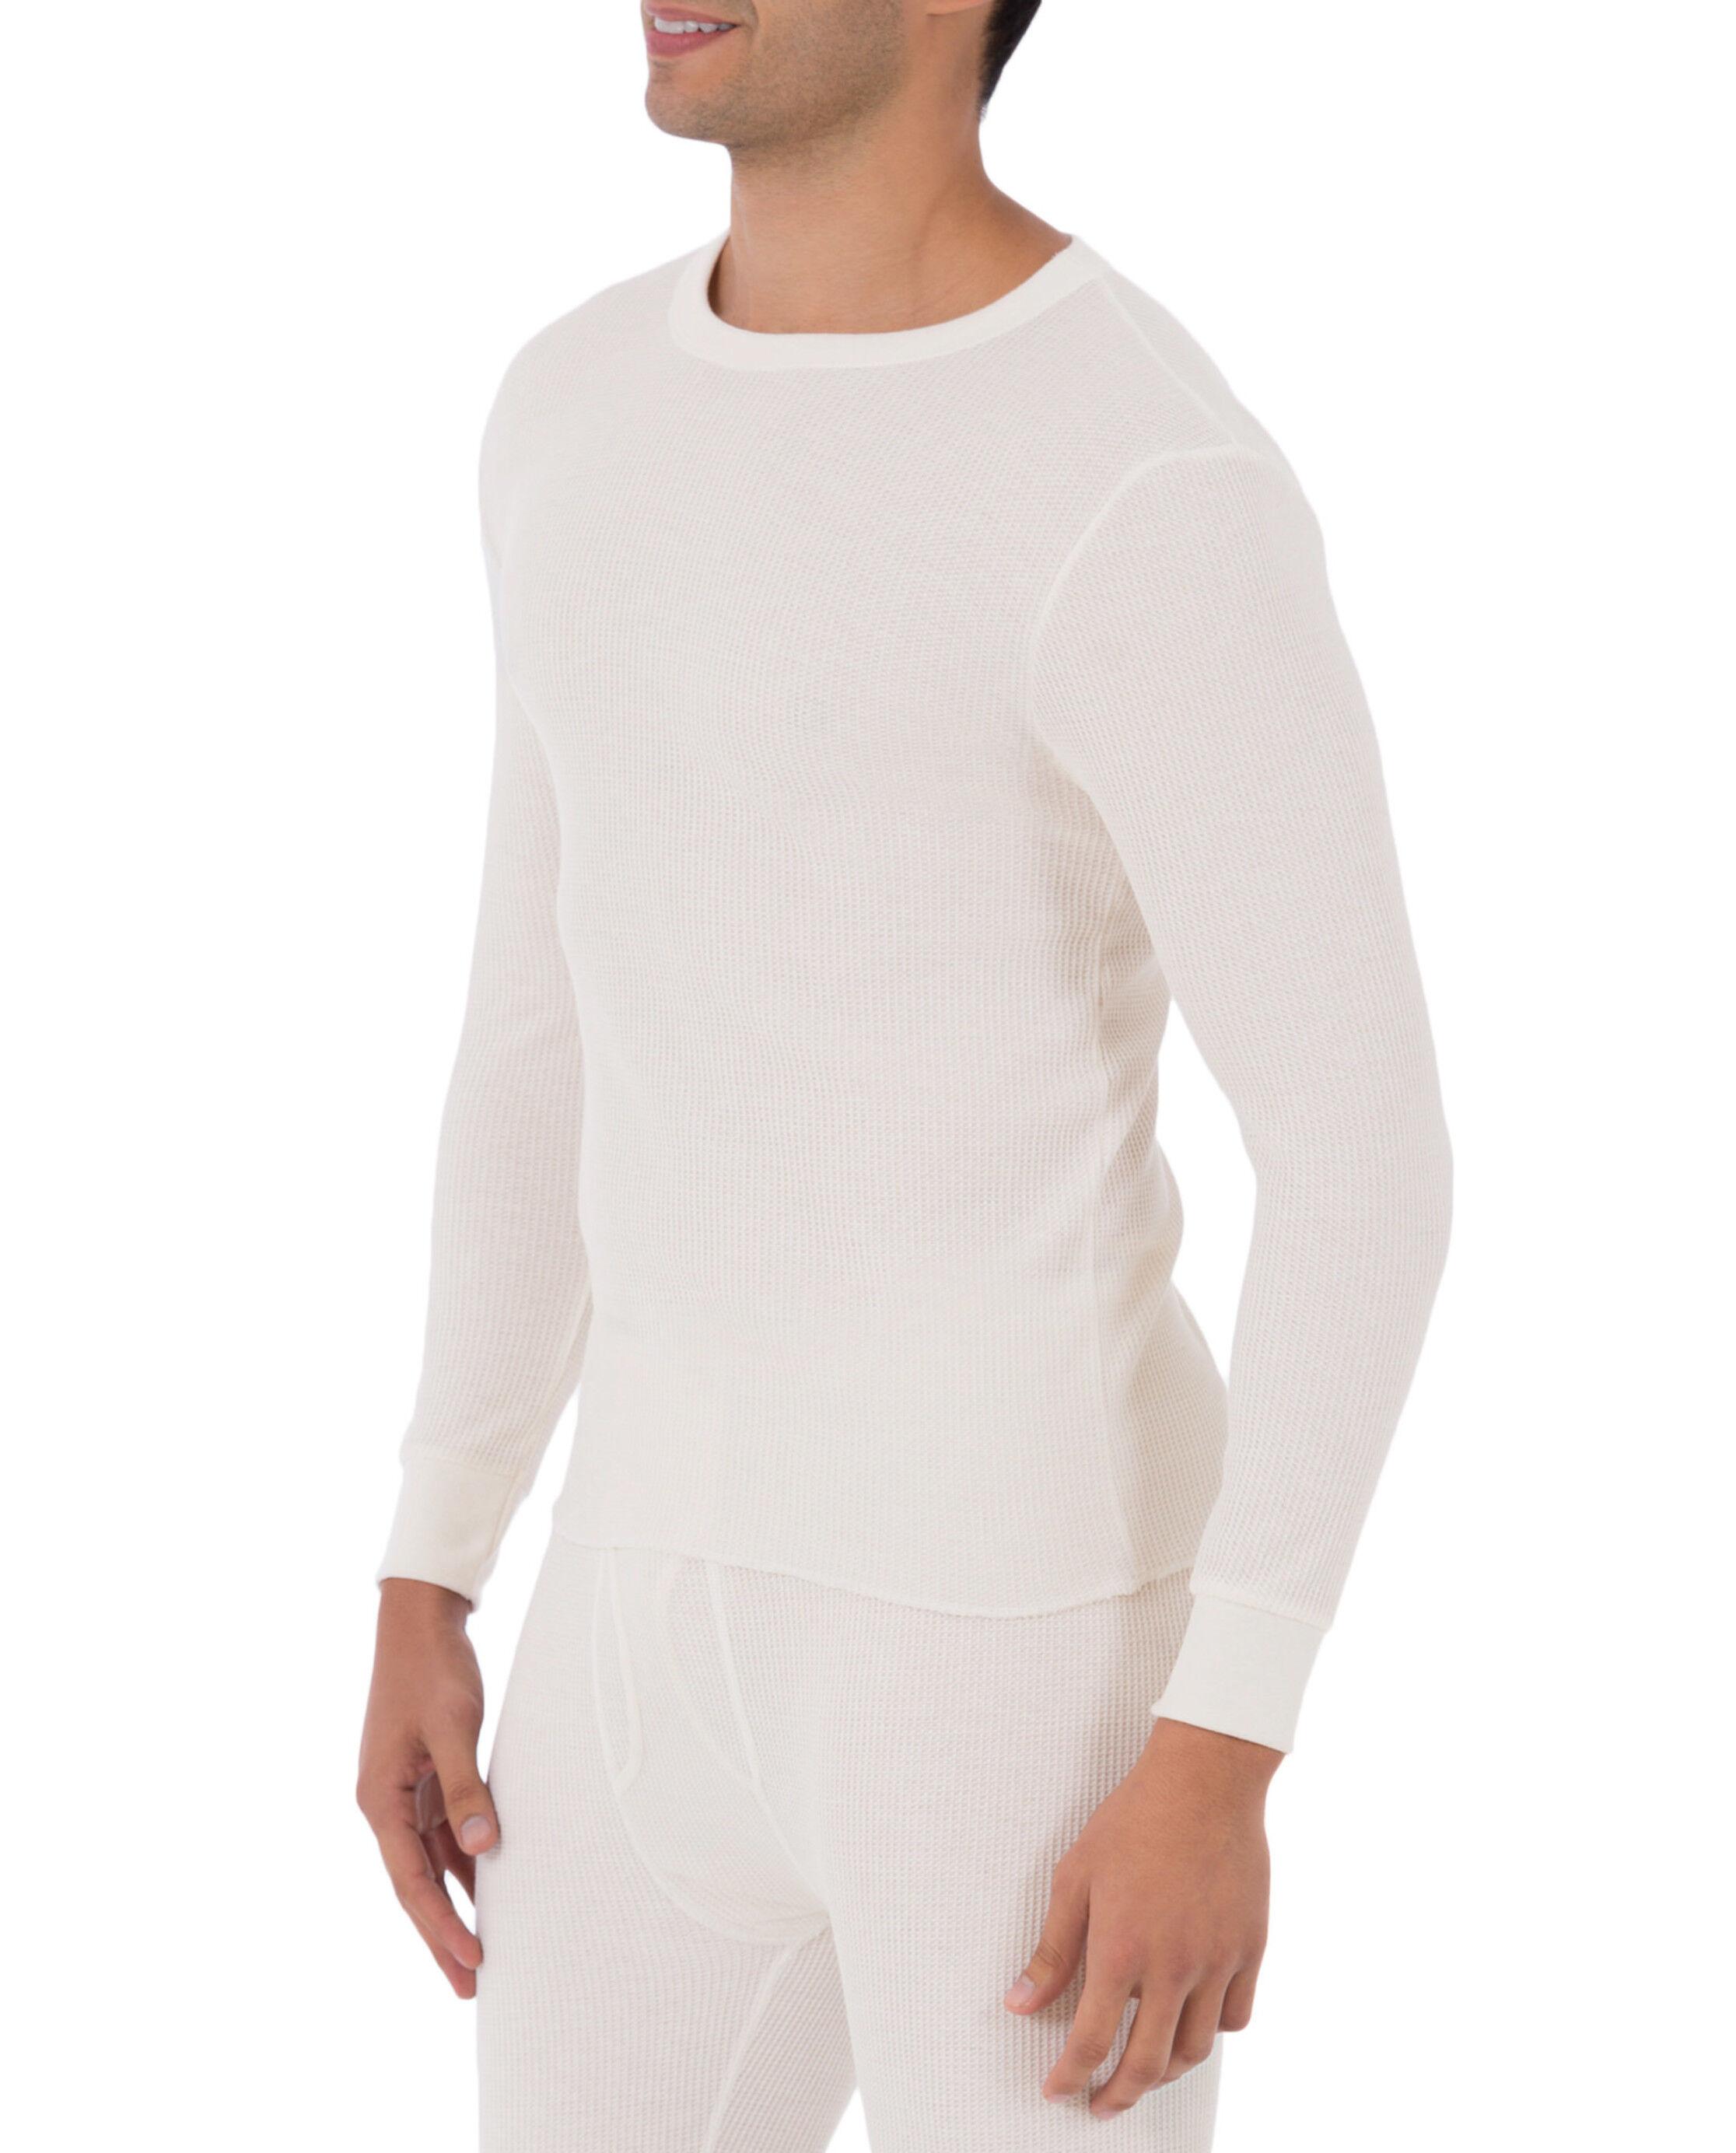 Gray Grey XL Fruit of the Loom Men/'s Thermal Crew Shirt Top 46-48